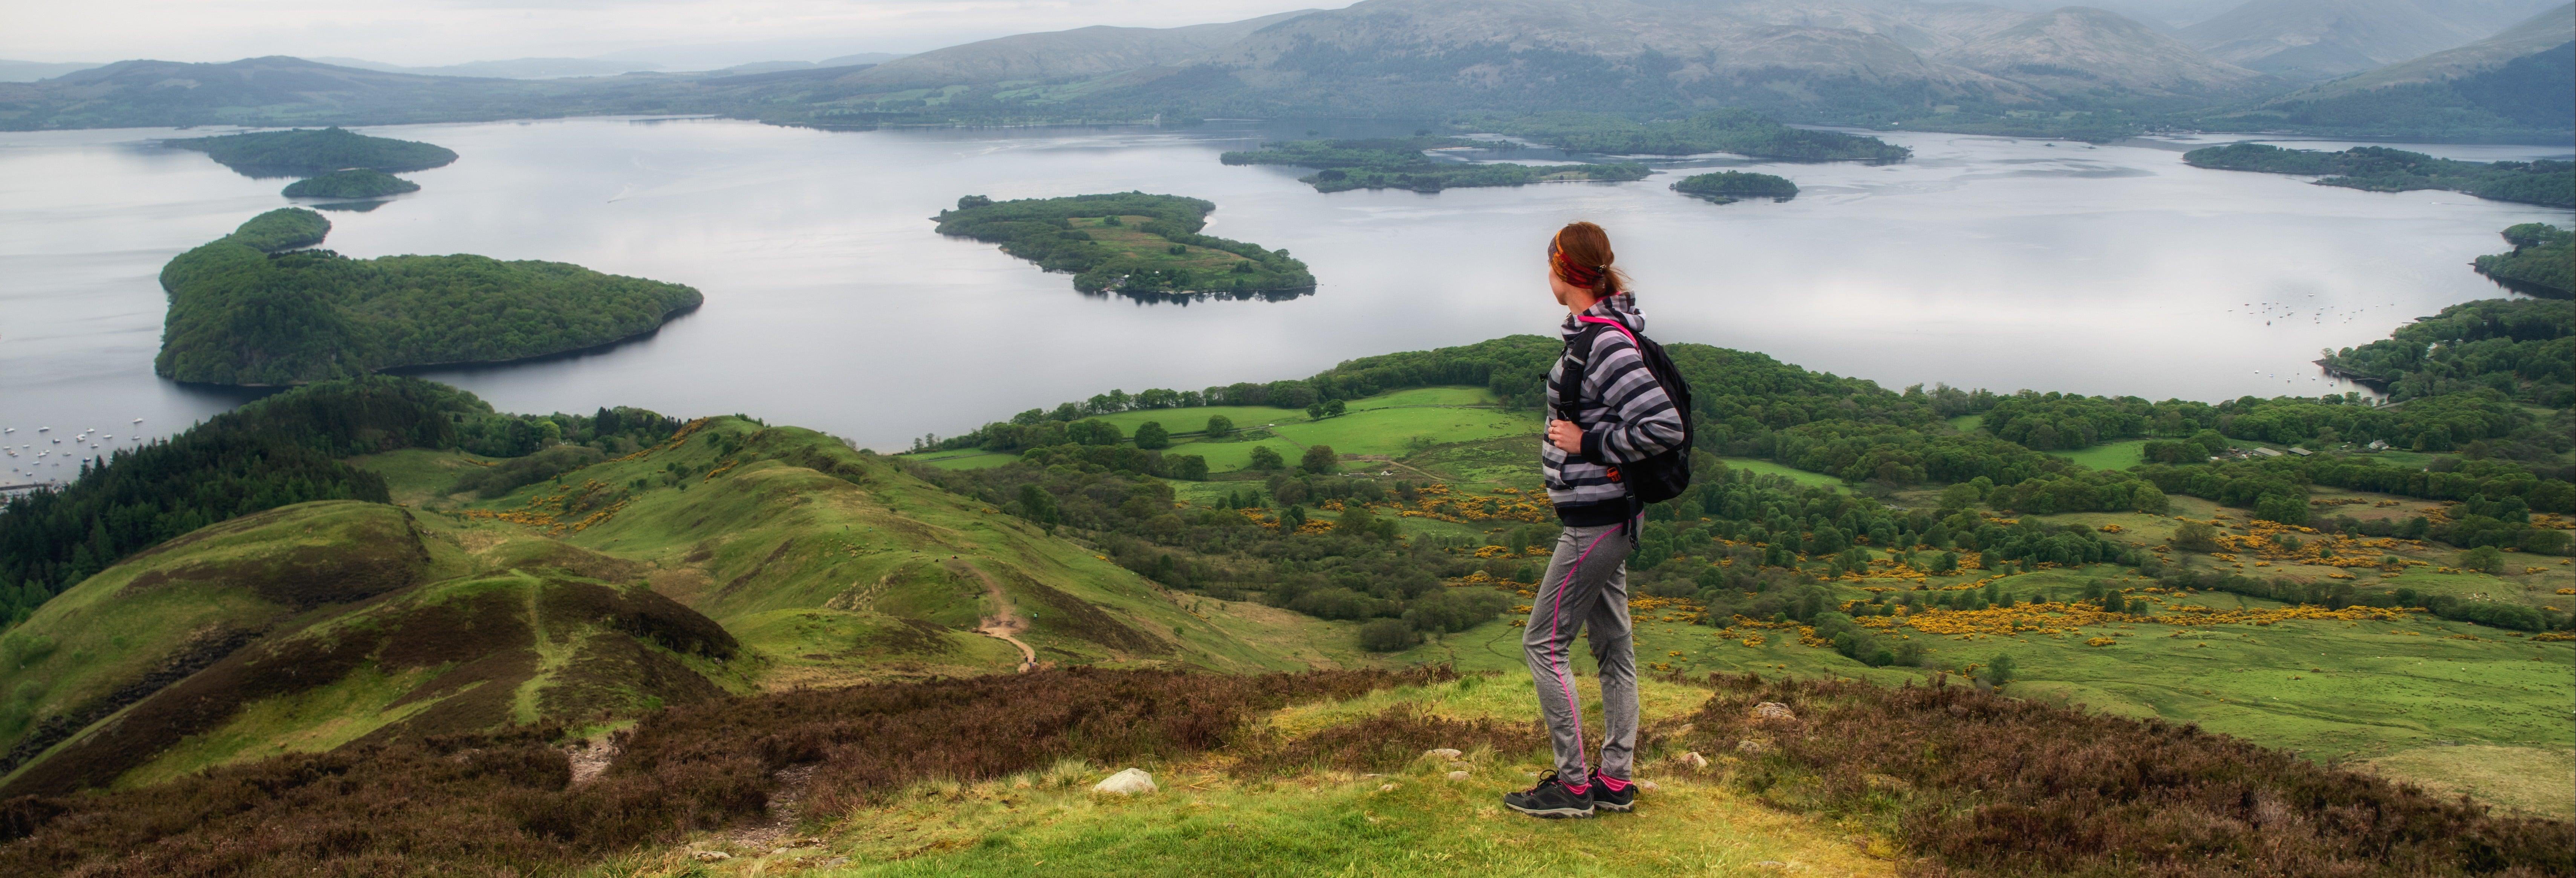 Excursão a Glasgow, lagos Lomond e Katrine